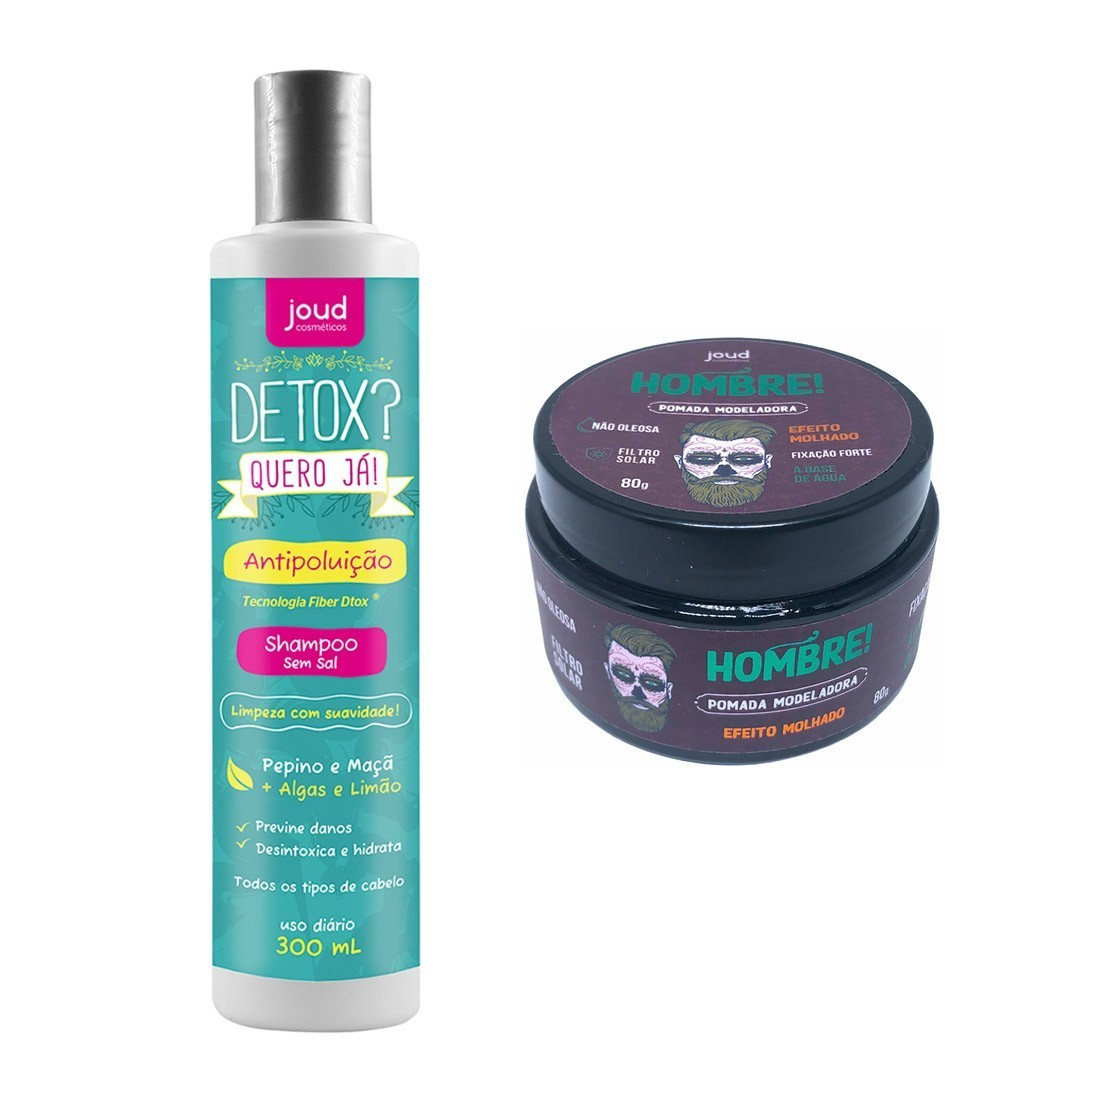 Kit Philippe Pomada efeito Molhado + Shampoo Detox